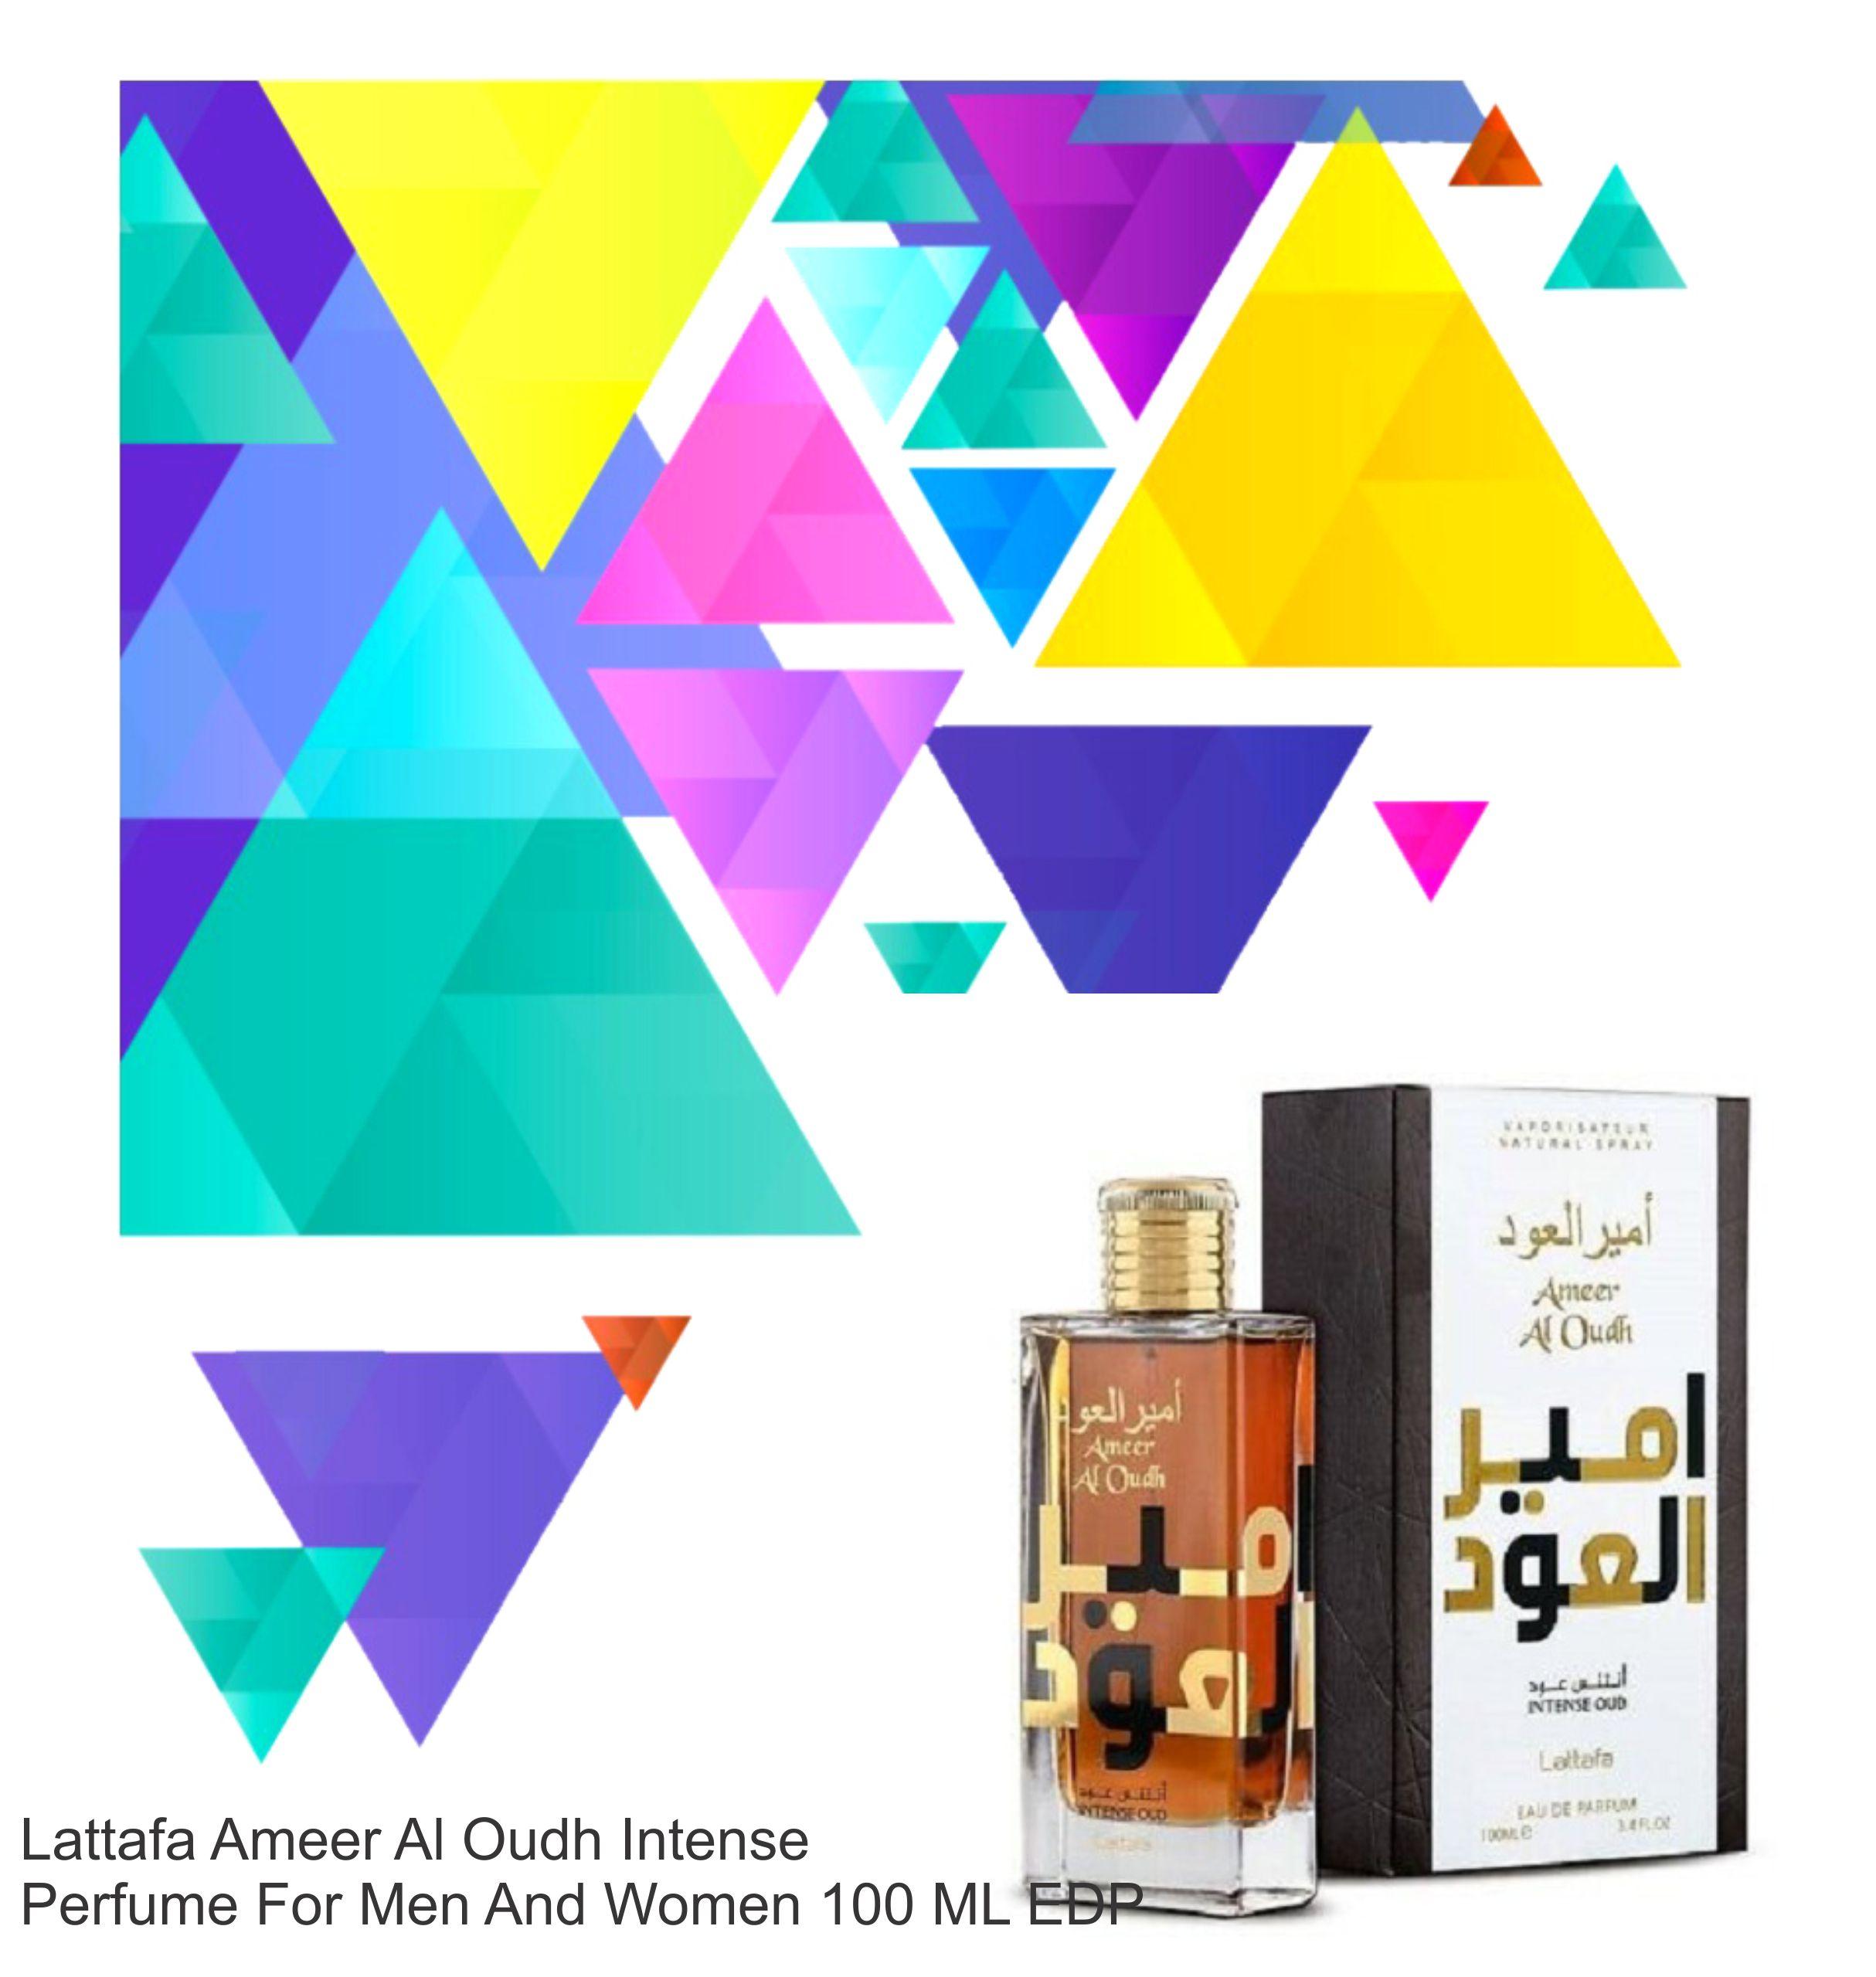 lattafa-ameer-al-oudh-intense-oud-perfume-for-men-and-women-100-ml-edp